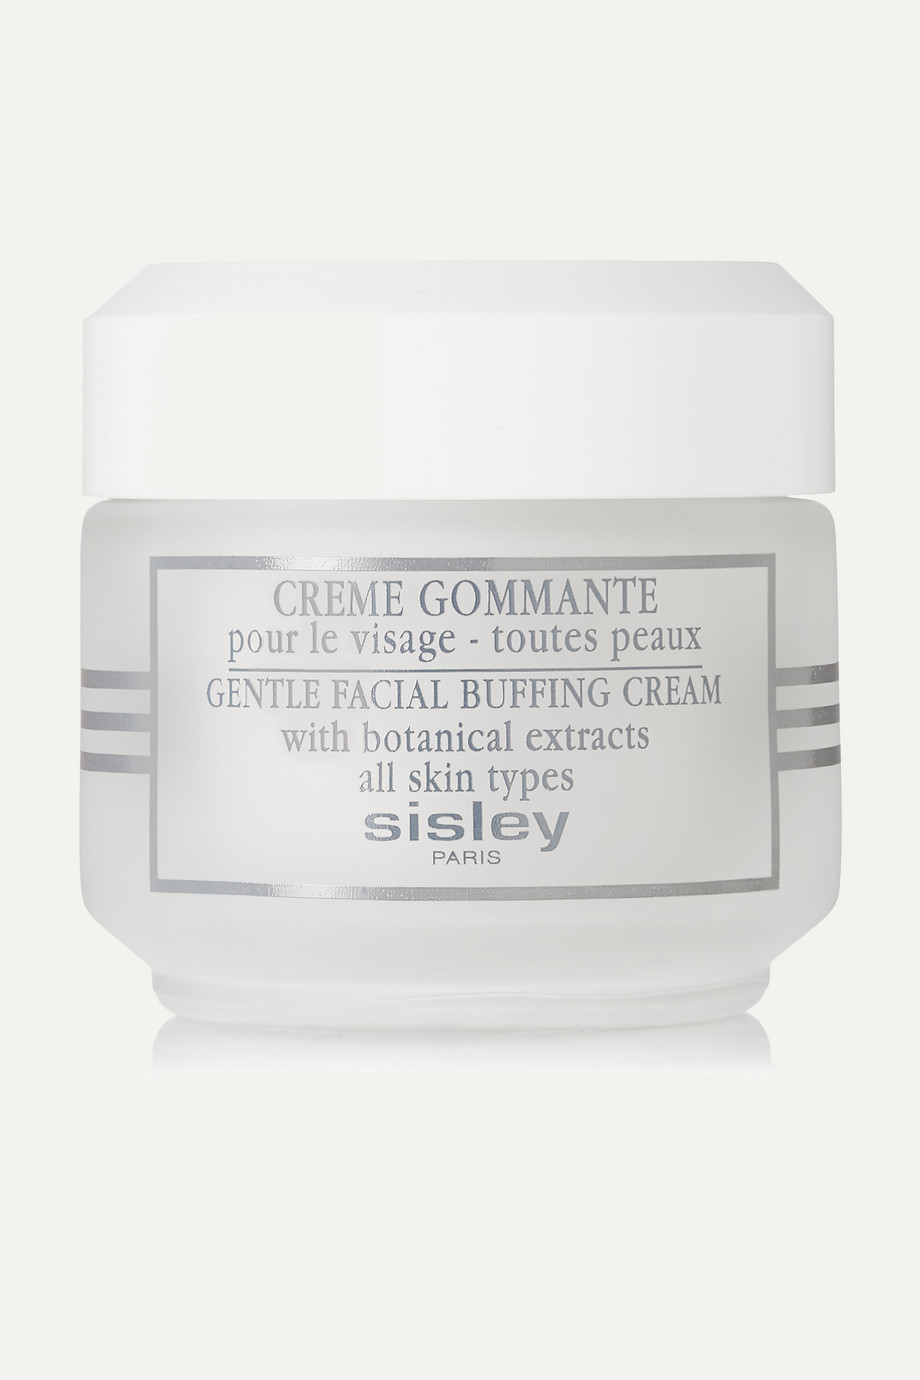 Sisley Gentle Facial Buffing Cream, 50 ml – Creme-Peeling